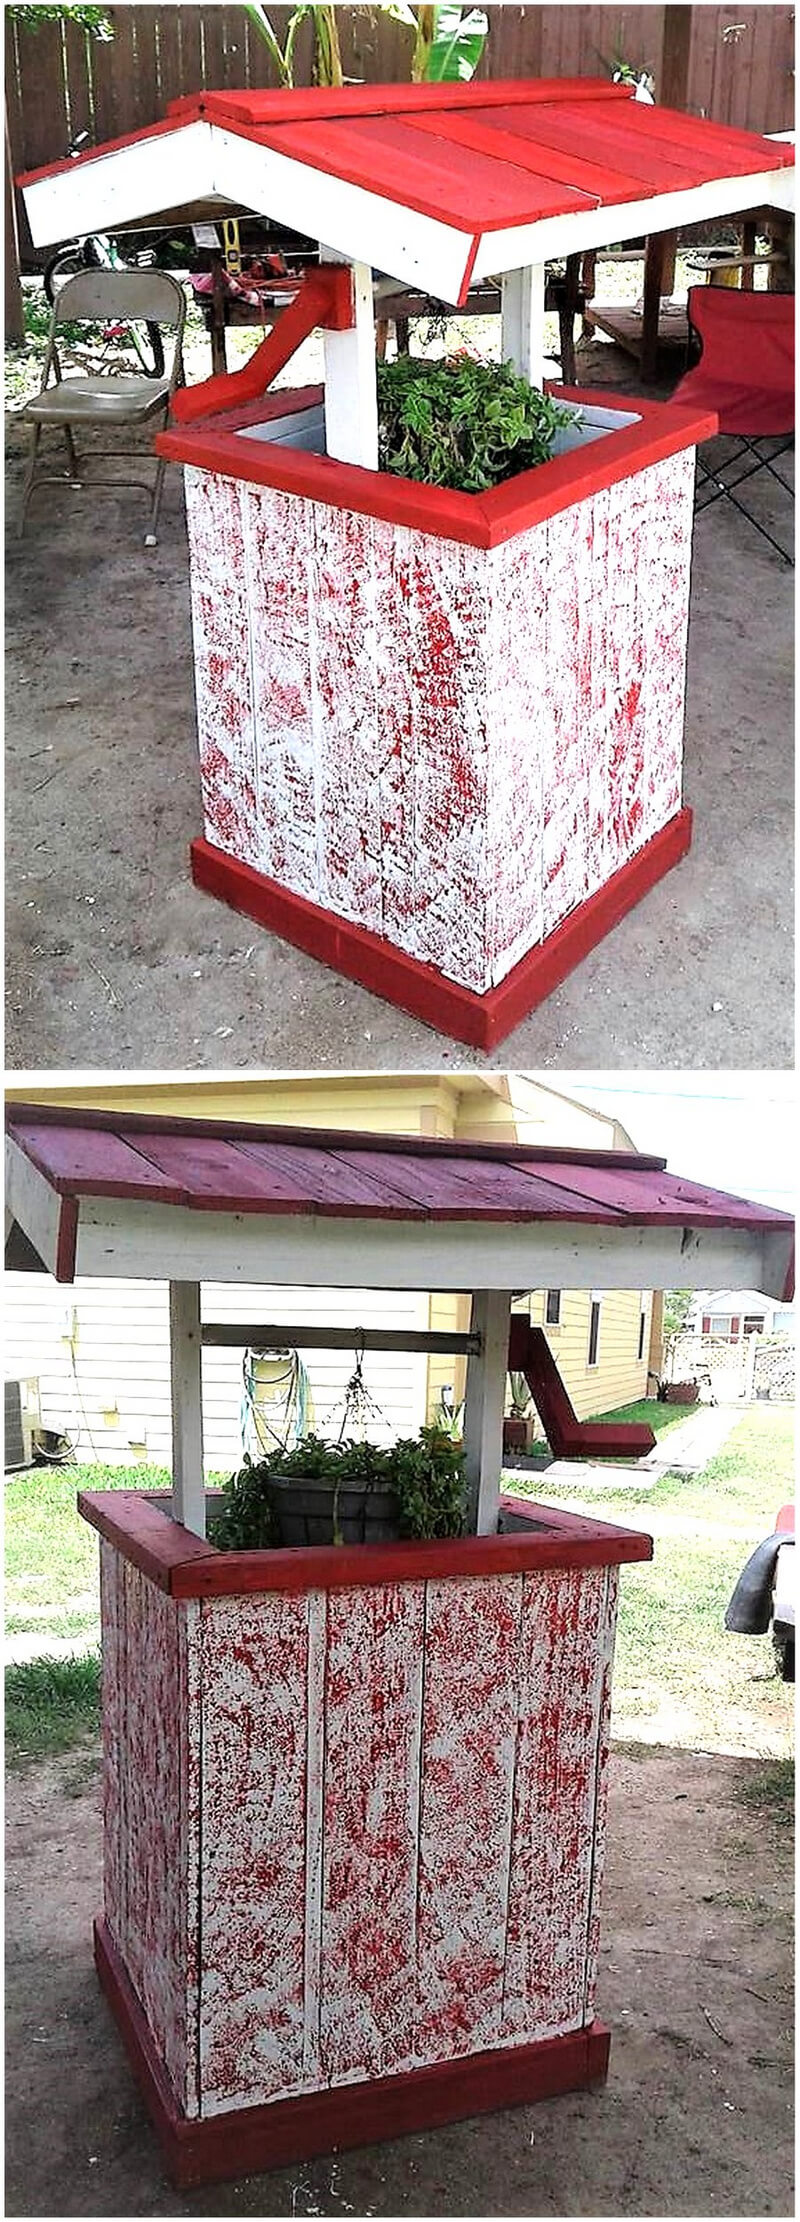 pallet decor crafting